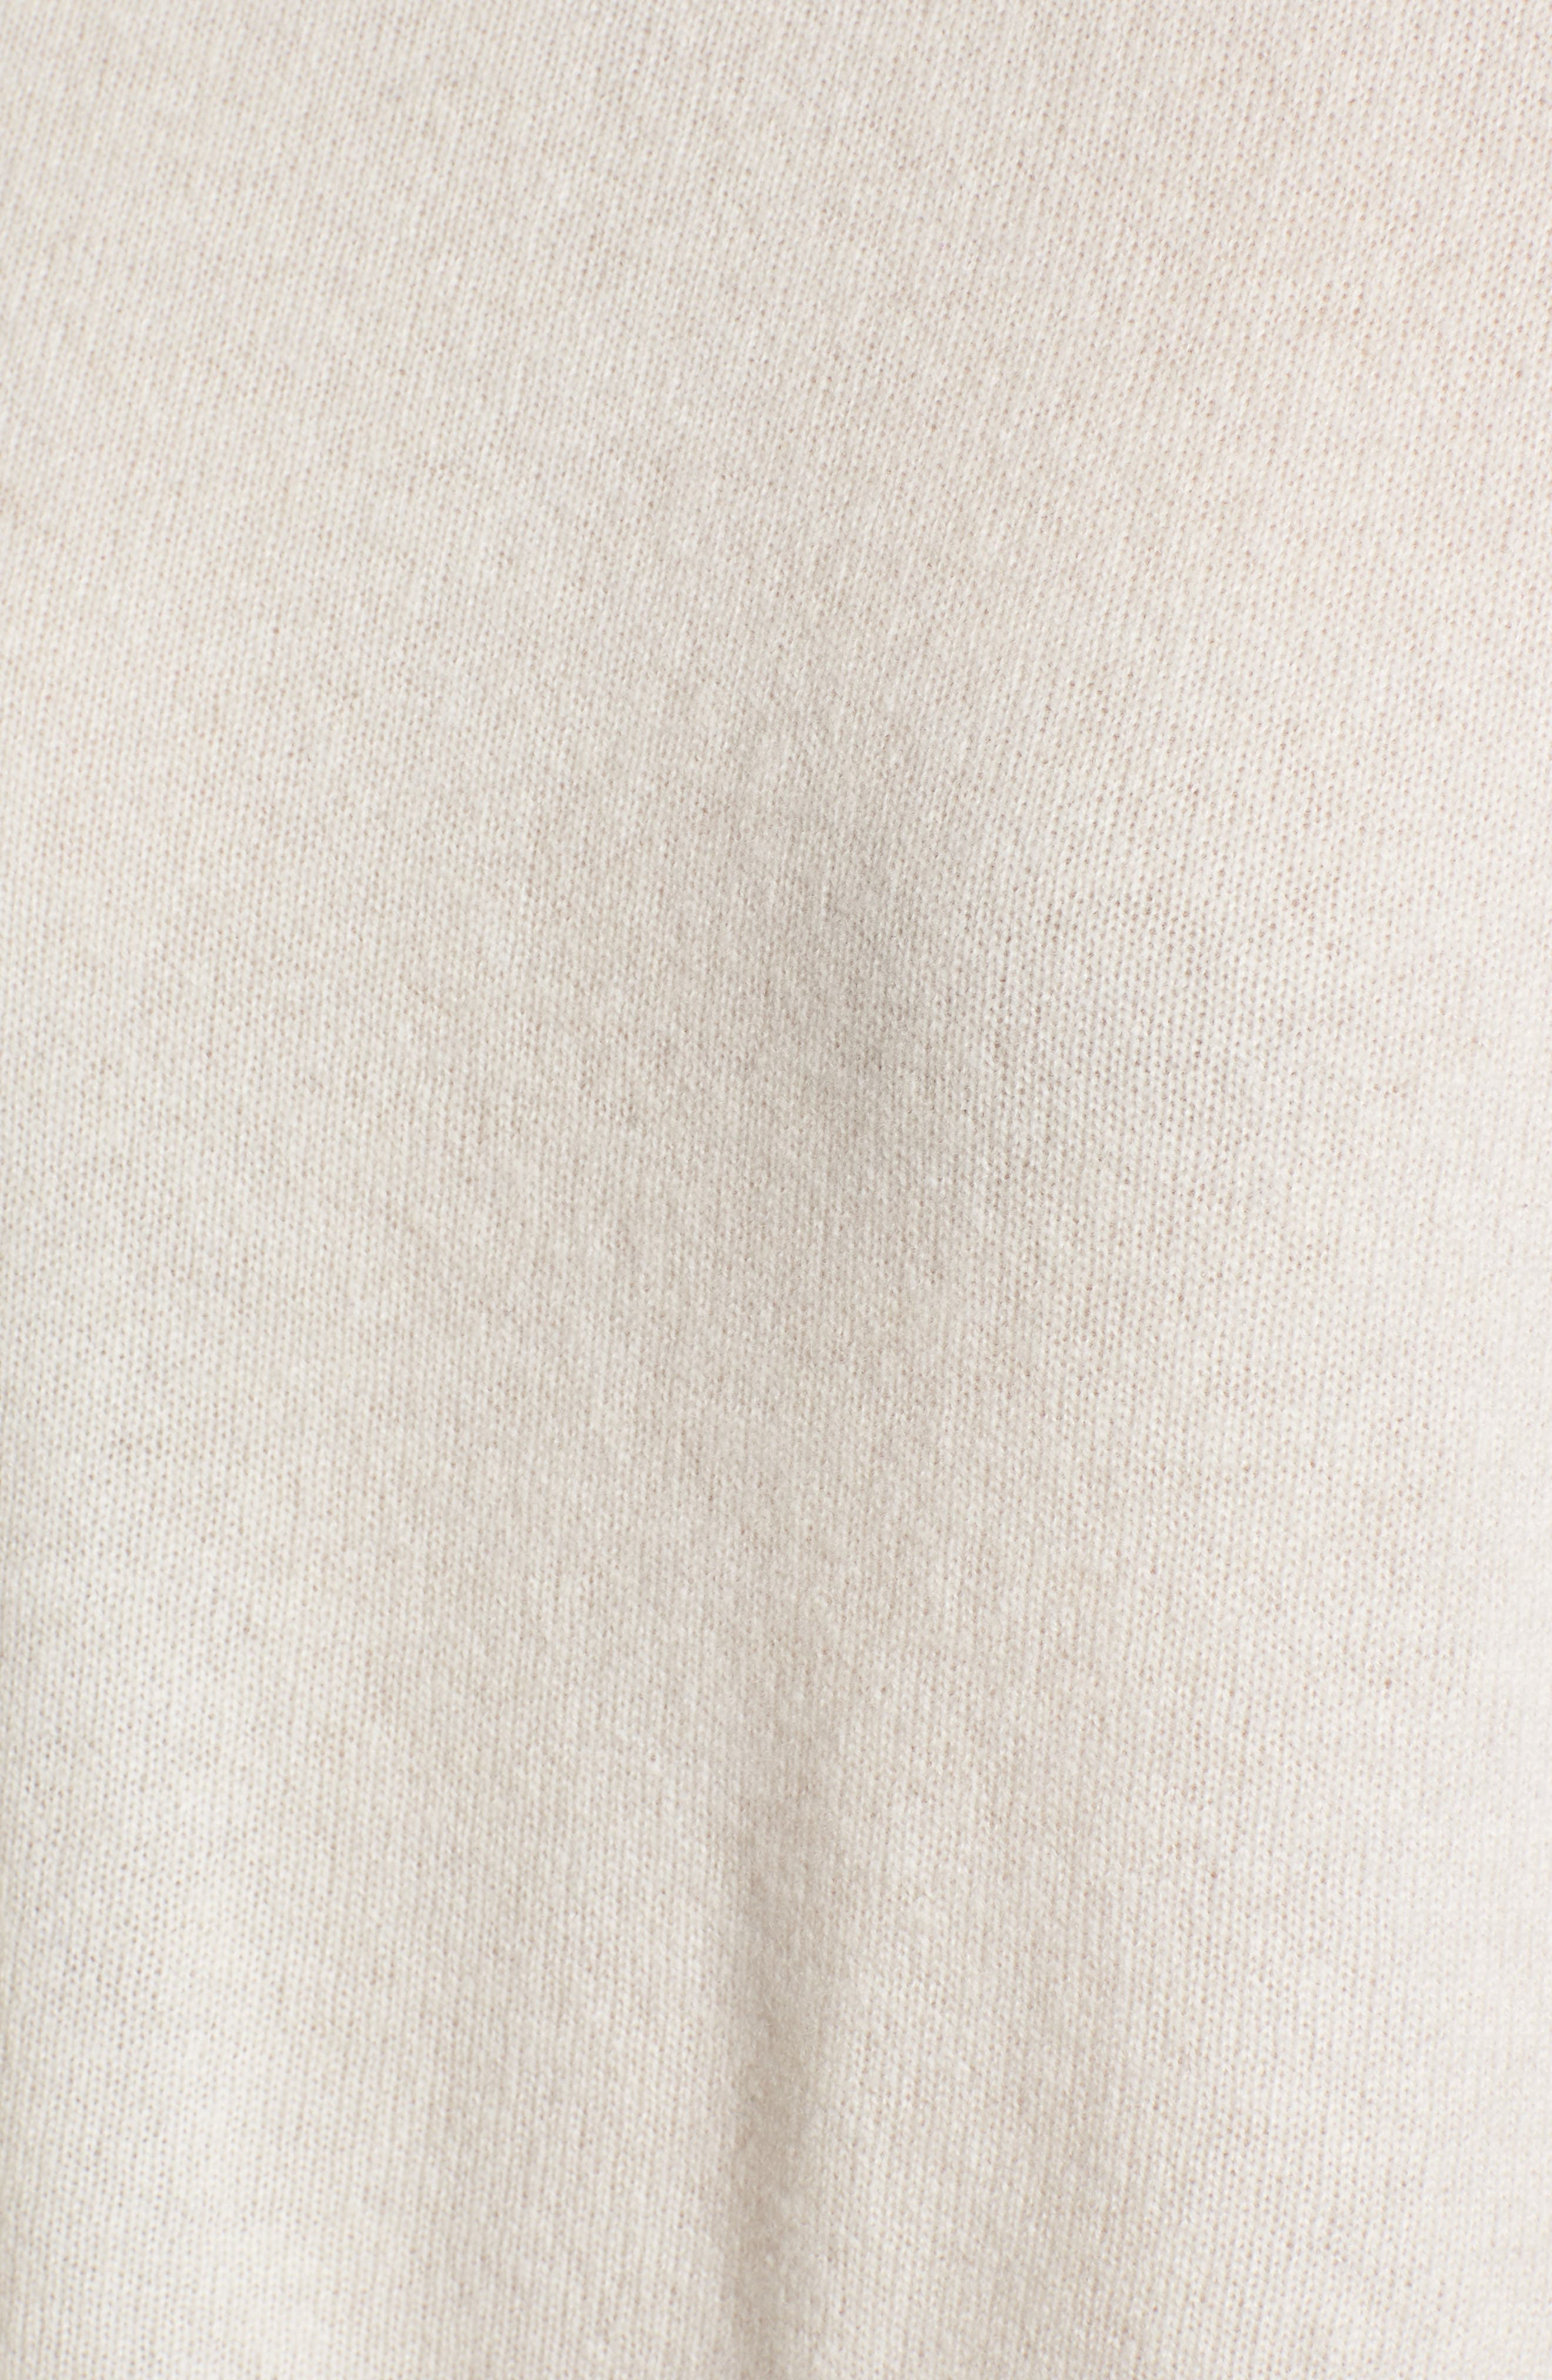 Button Detail Cashmere Sweater,                             Alternate thumbnail 9, color,